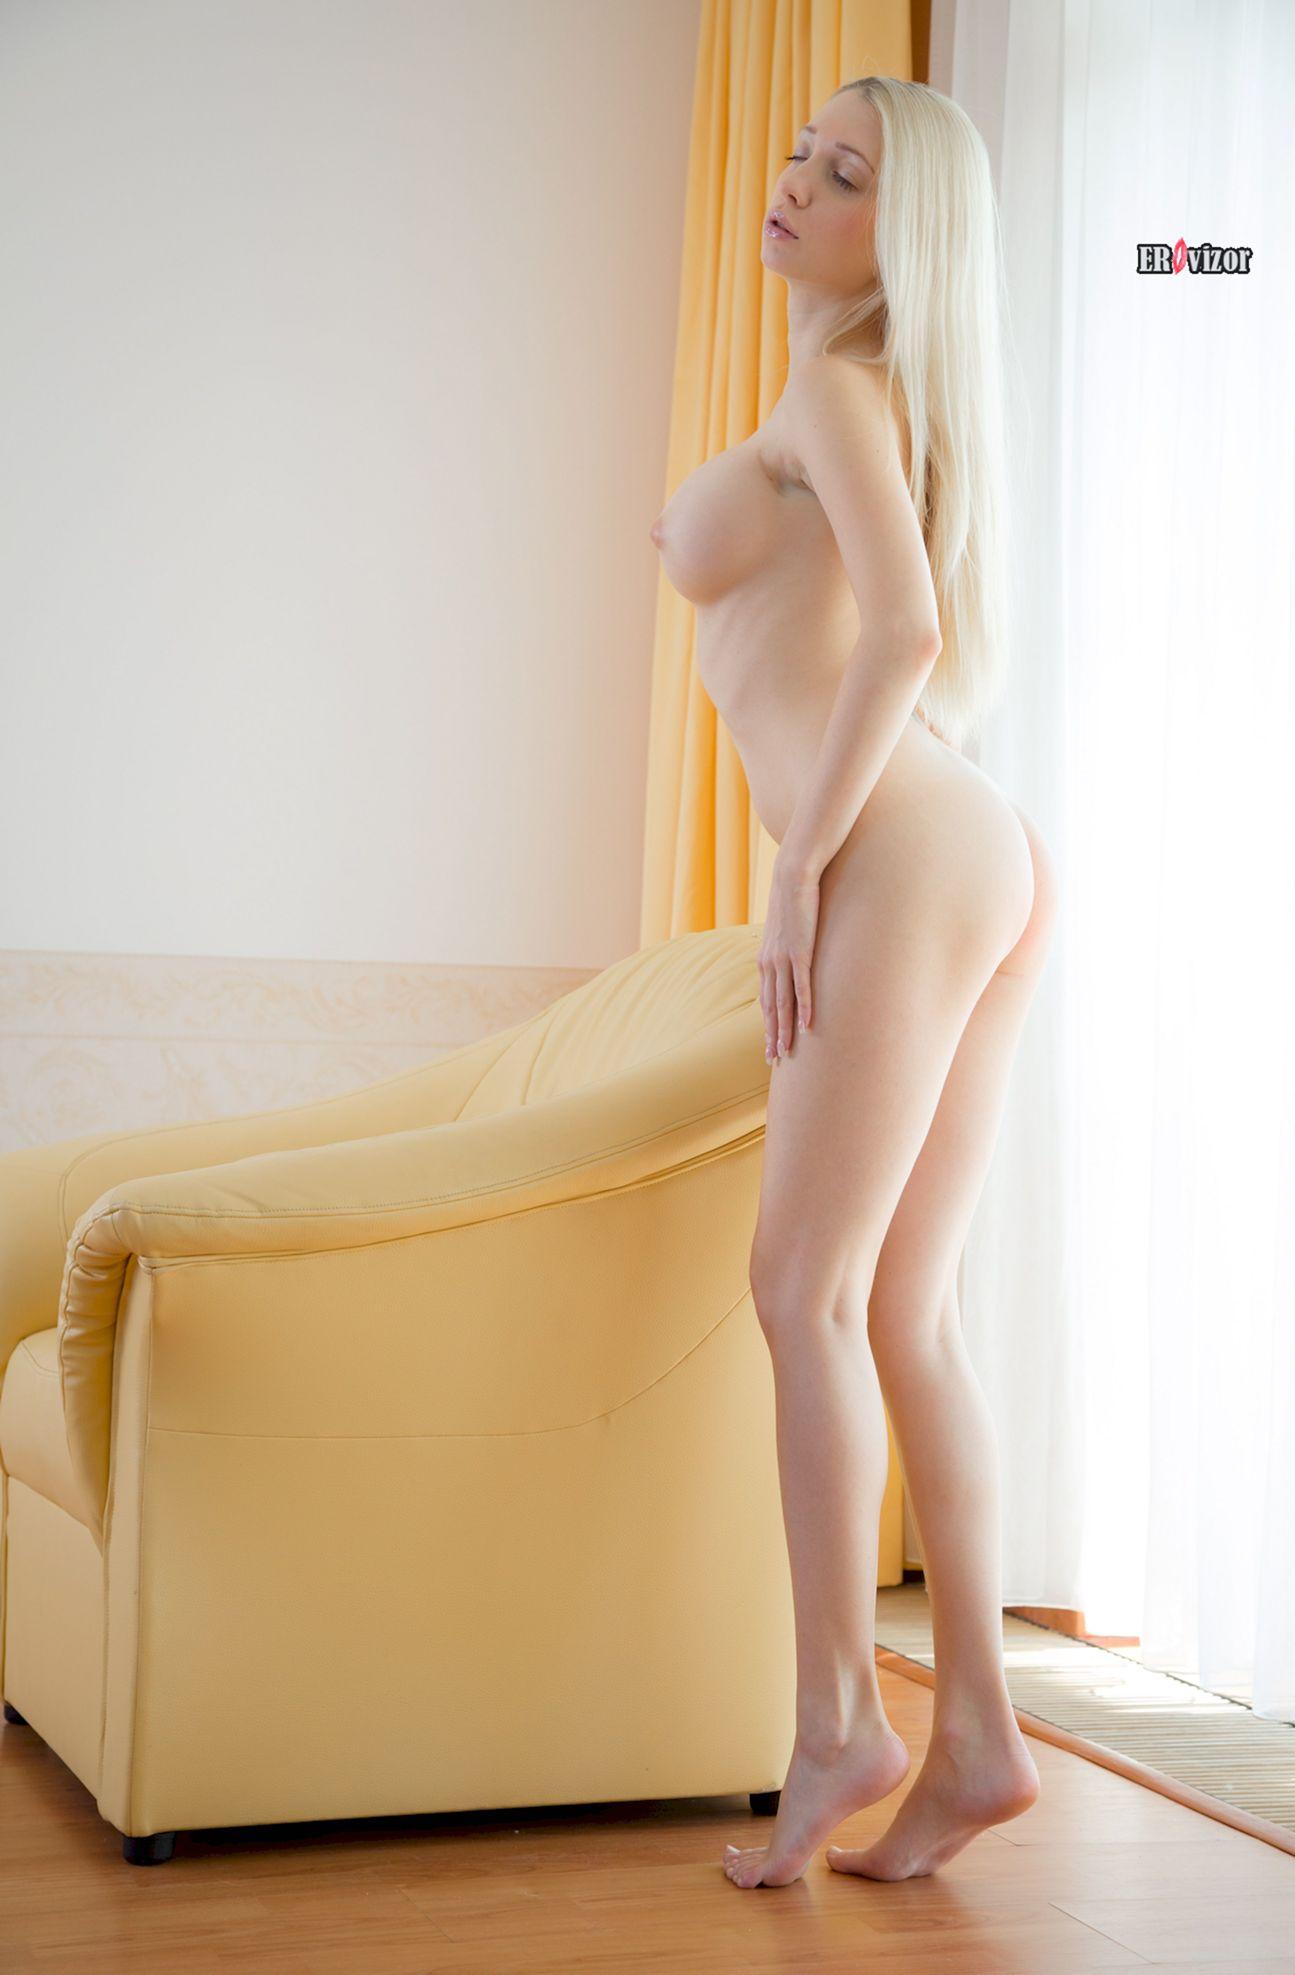 Busty-Blonde-Lolita-Miriama-Kunkelova-1 (8)